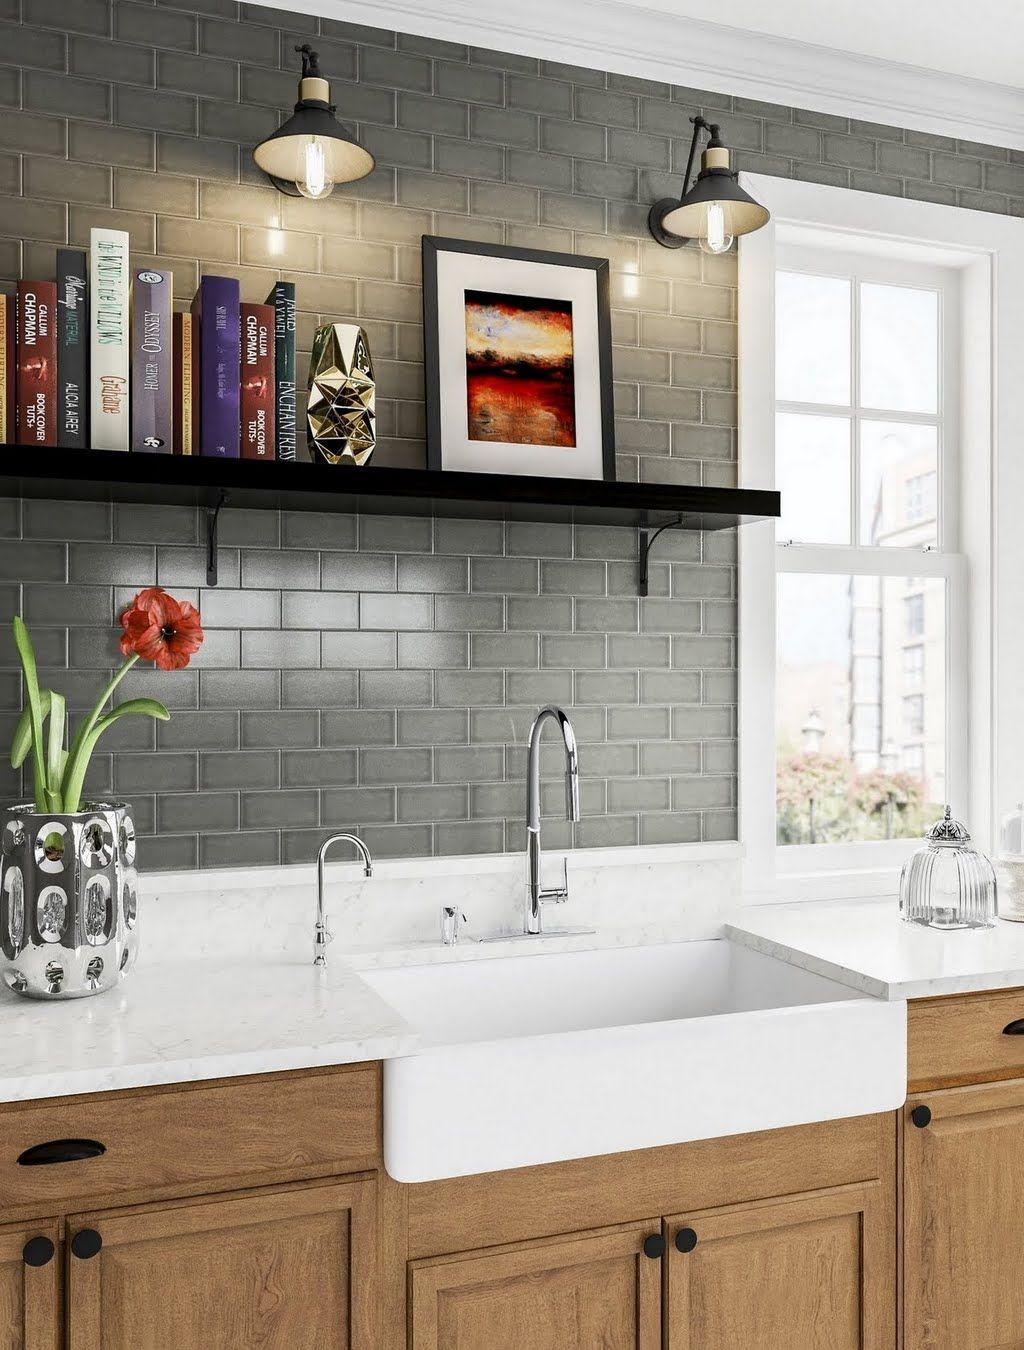 GrayGreen Kitchen with DropIn Sink Kitchen The Home